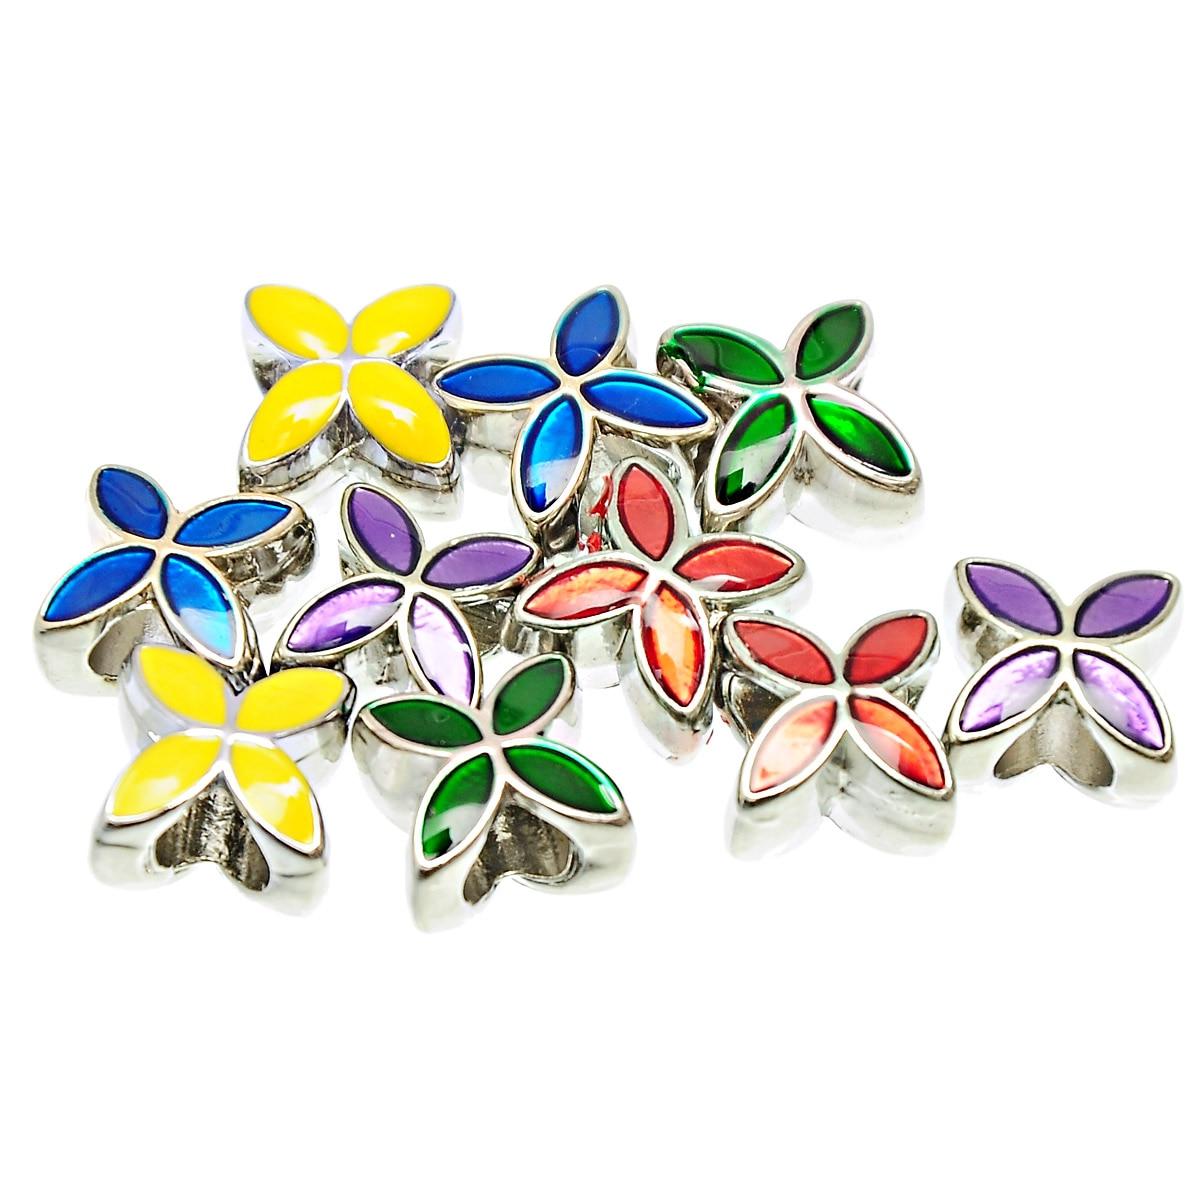 DoreenBeads 10 PCs Mixed Enamel 4 Petals Flower Charms Beads Fit European Cha